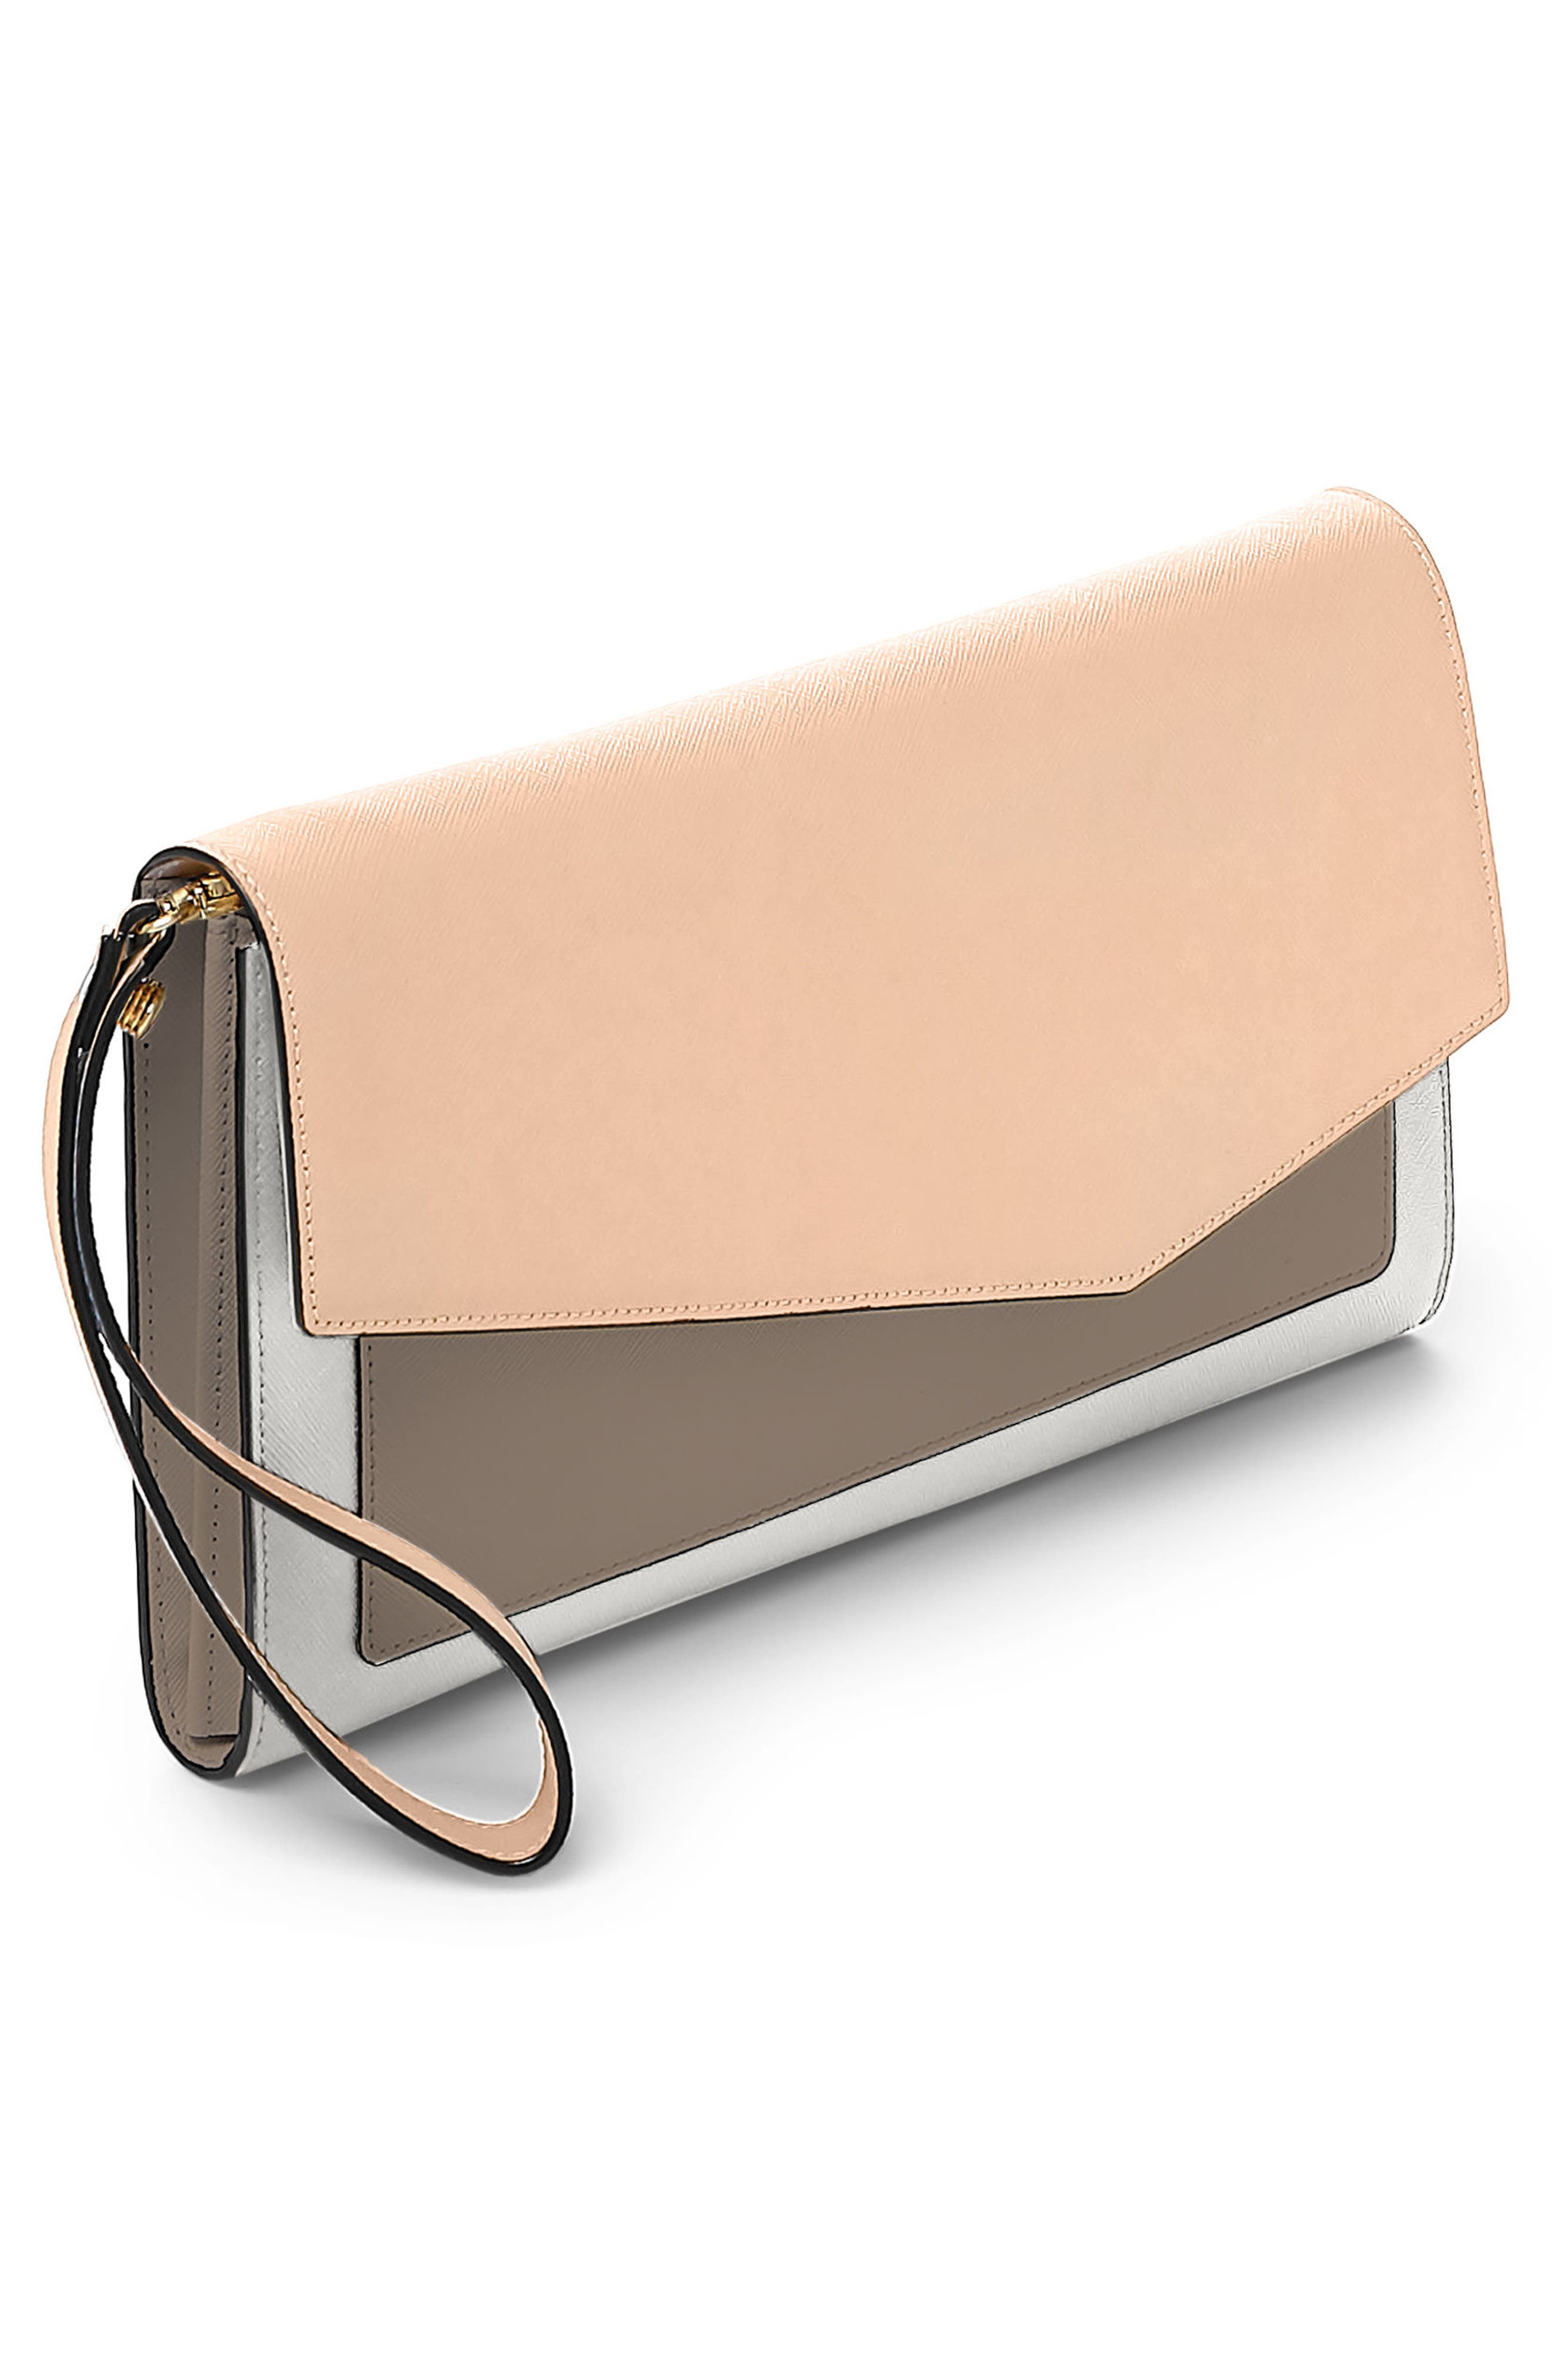 Cobble Hill Leather Wallet,                             Alternate thumbnail 4, color,                             Peach Colorblock